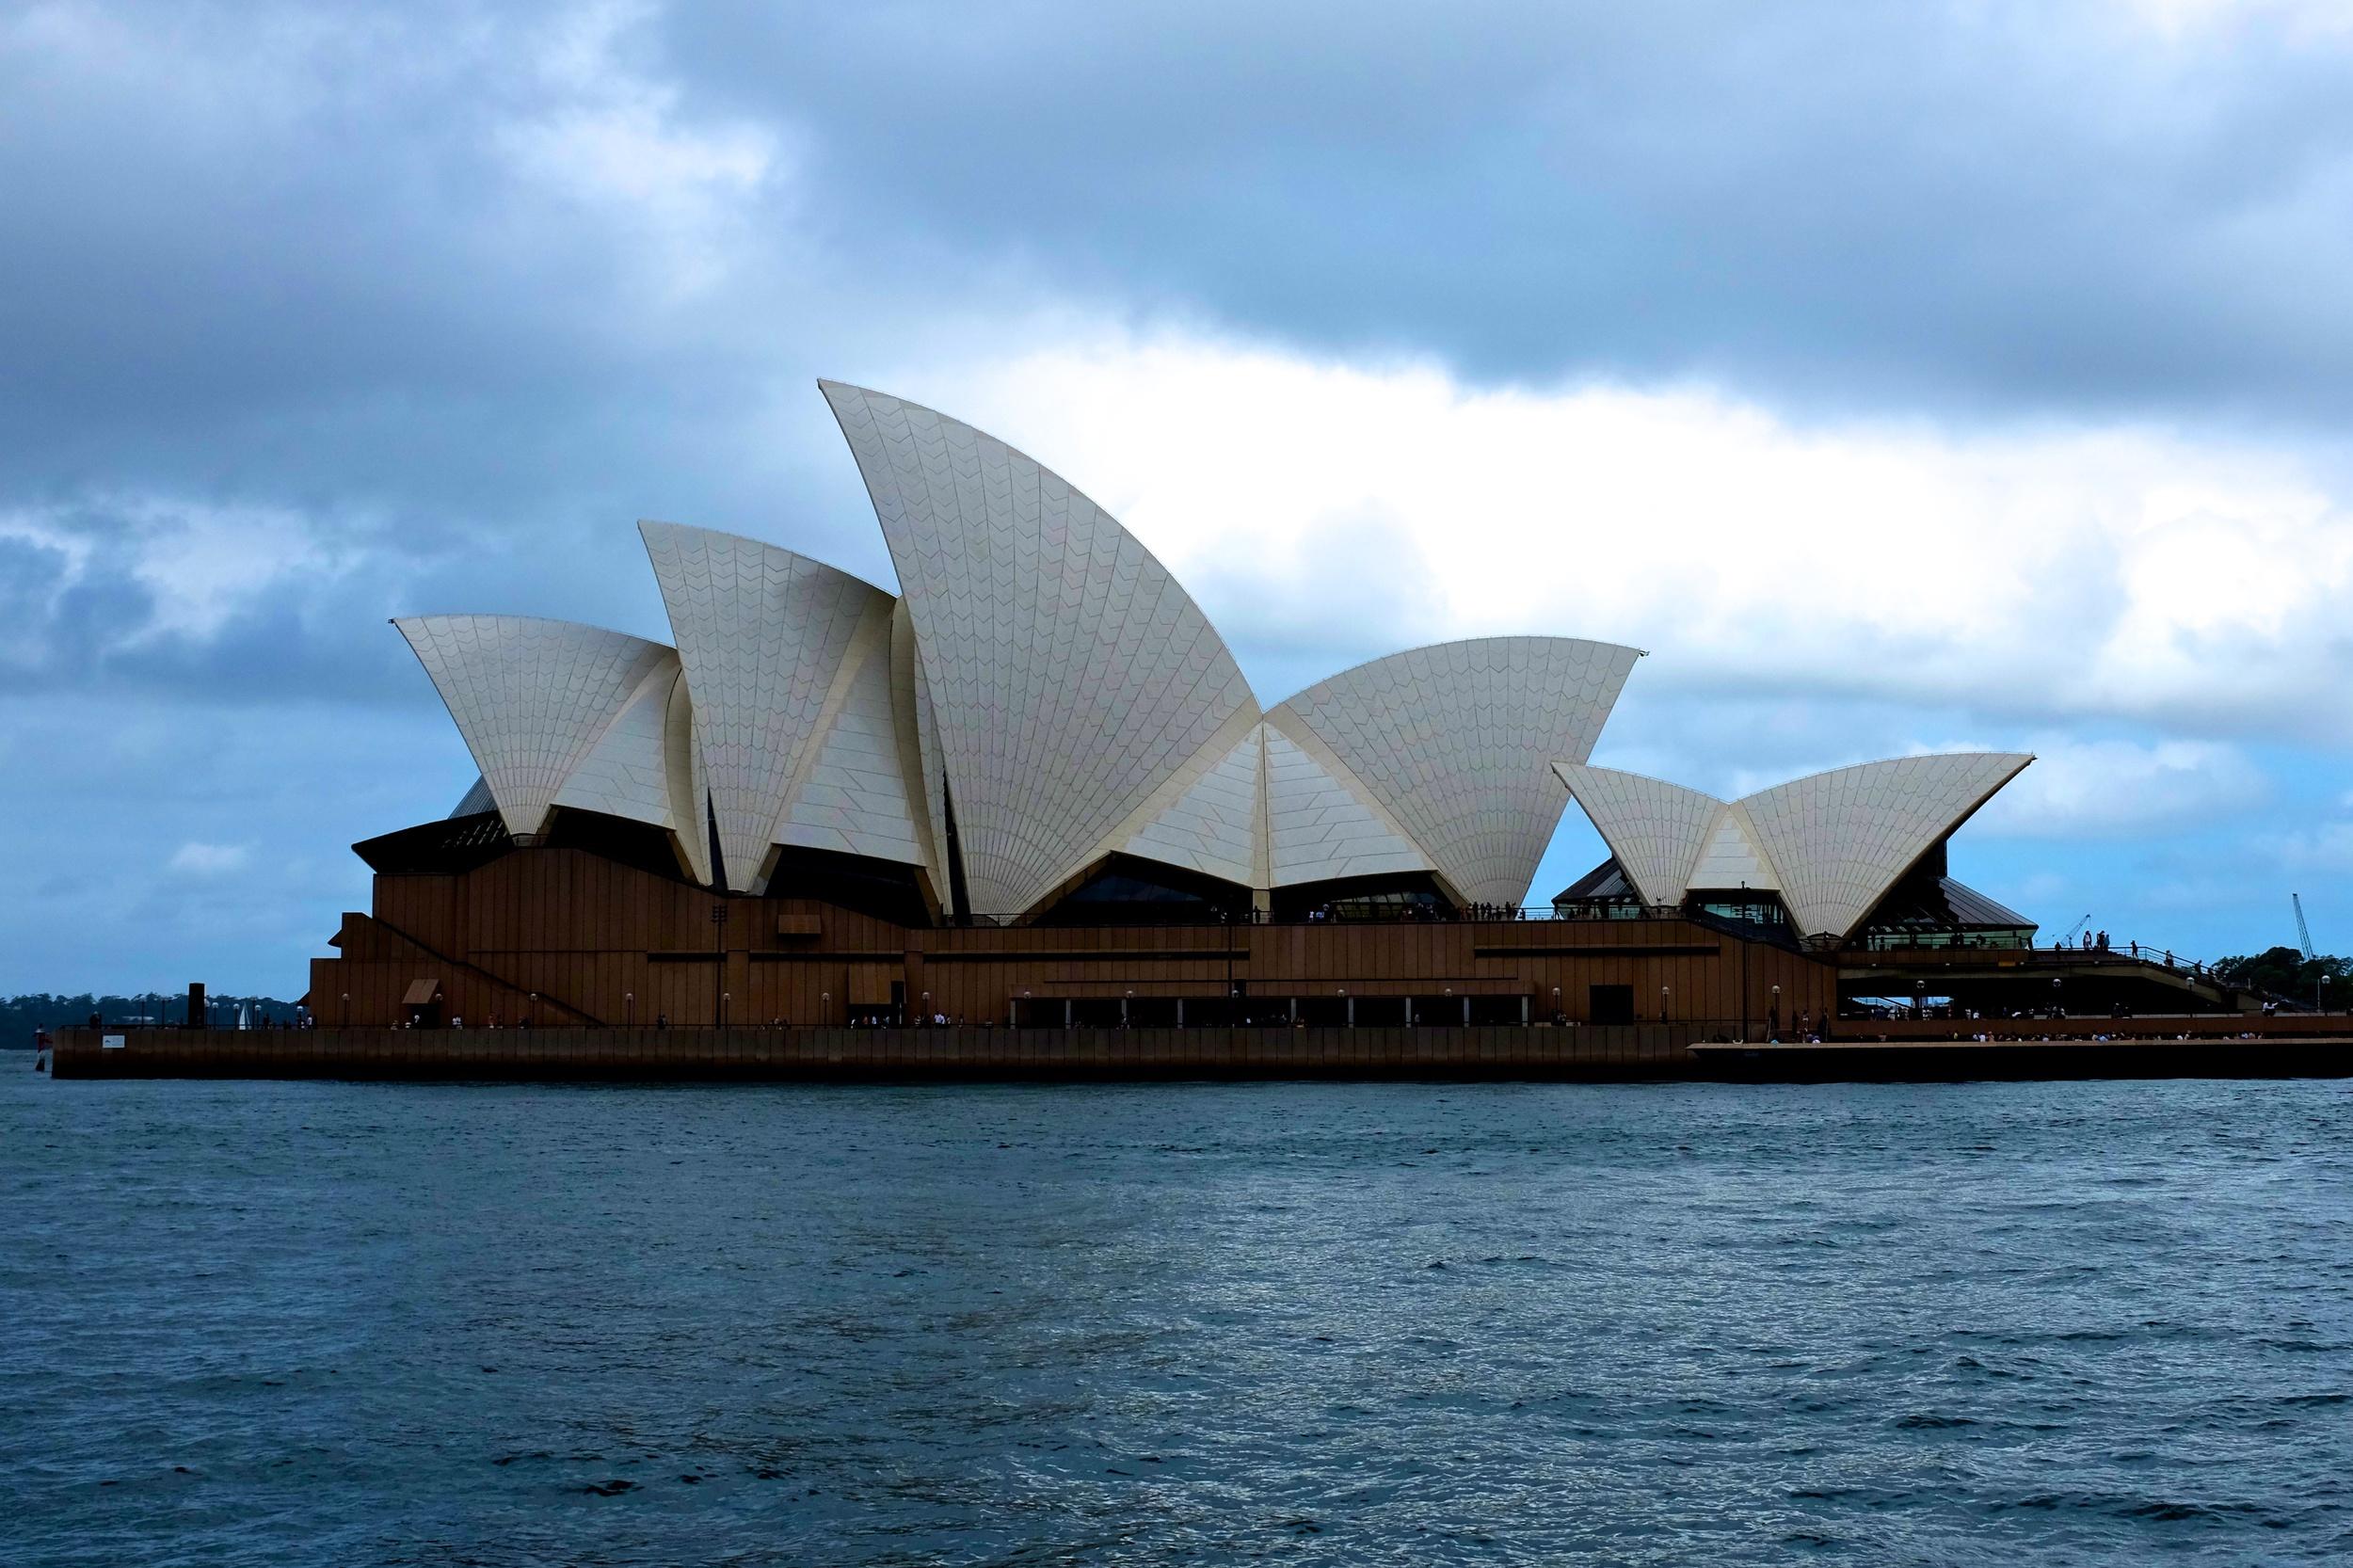 Sightseeing in Sydney